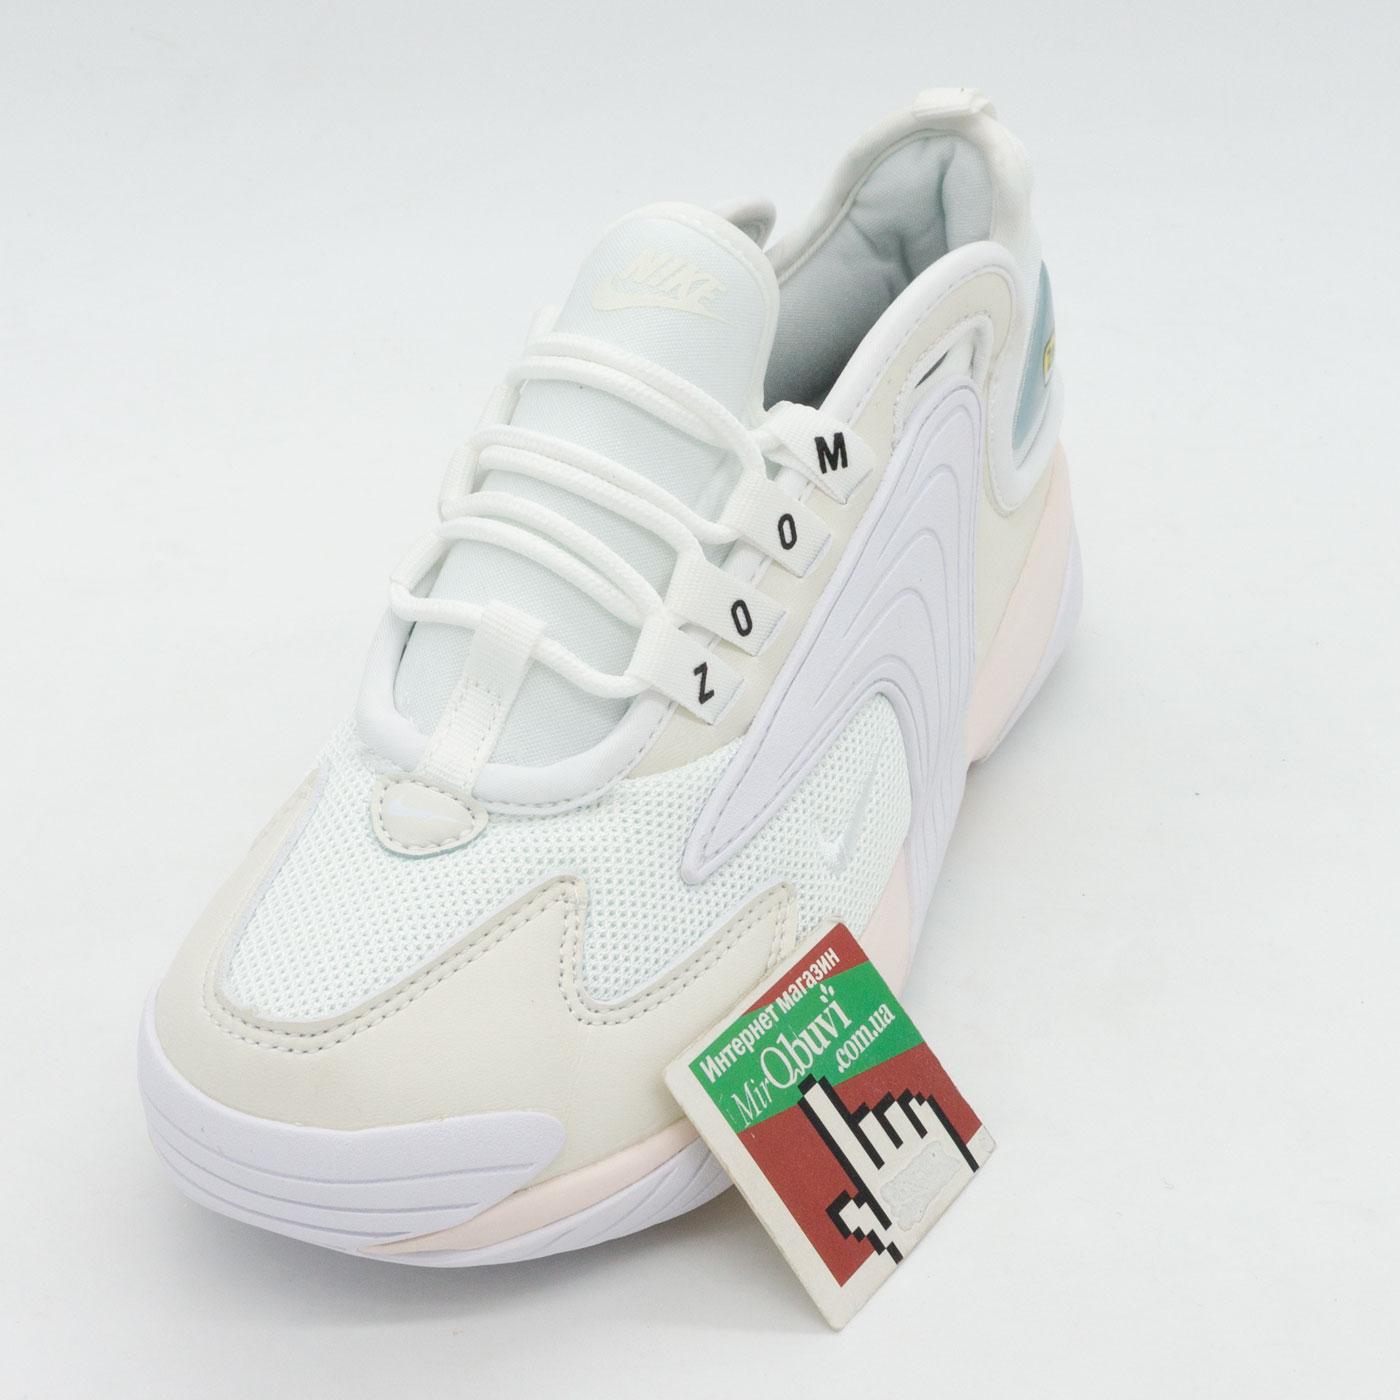 фото front Кроссовки Nike Zoom 2K белые. Топ качество! front